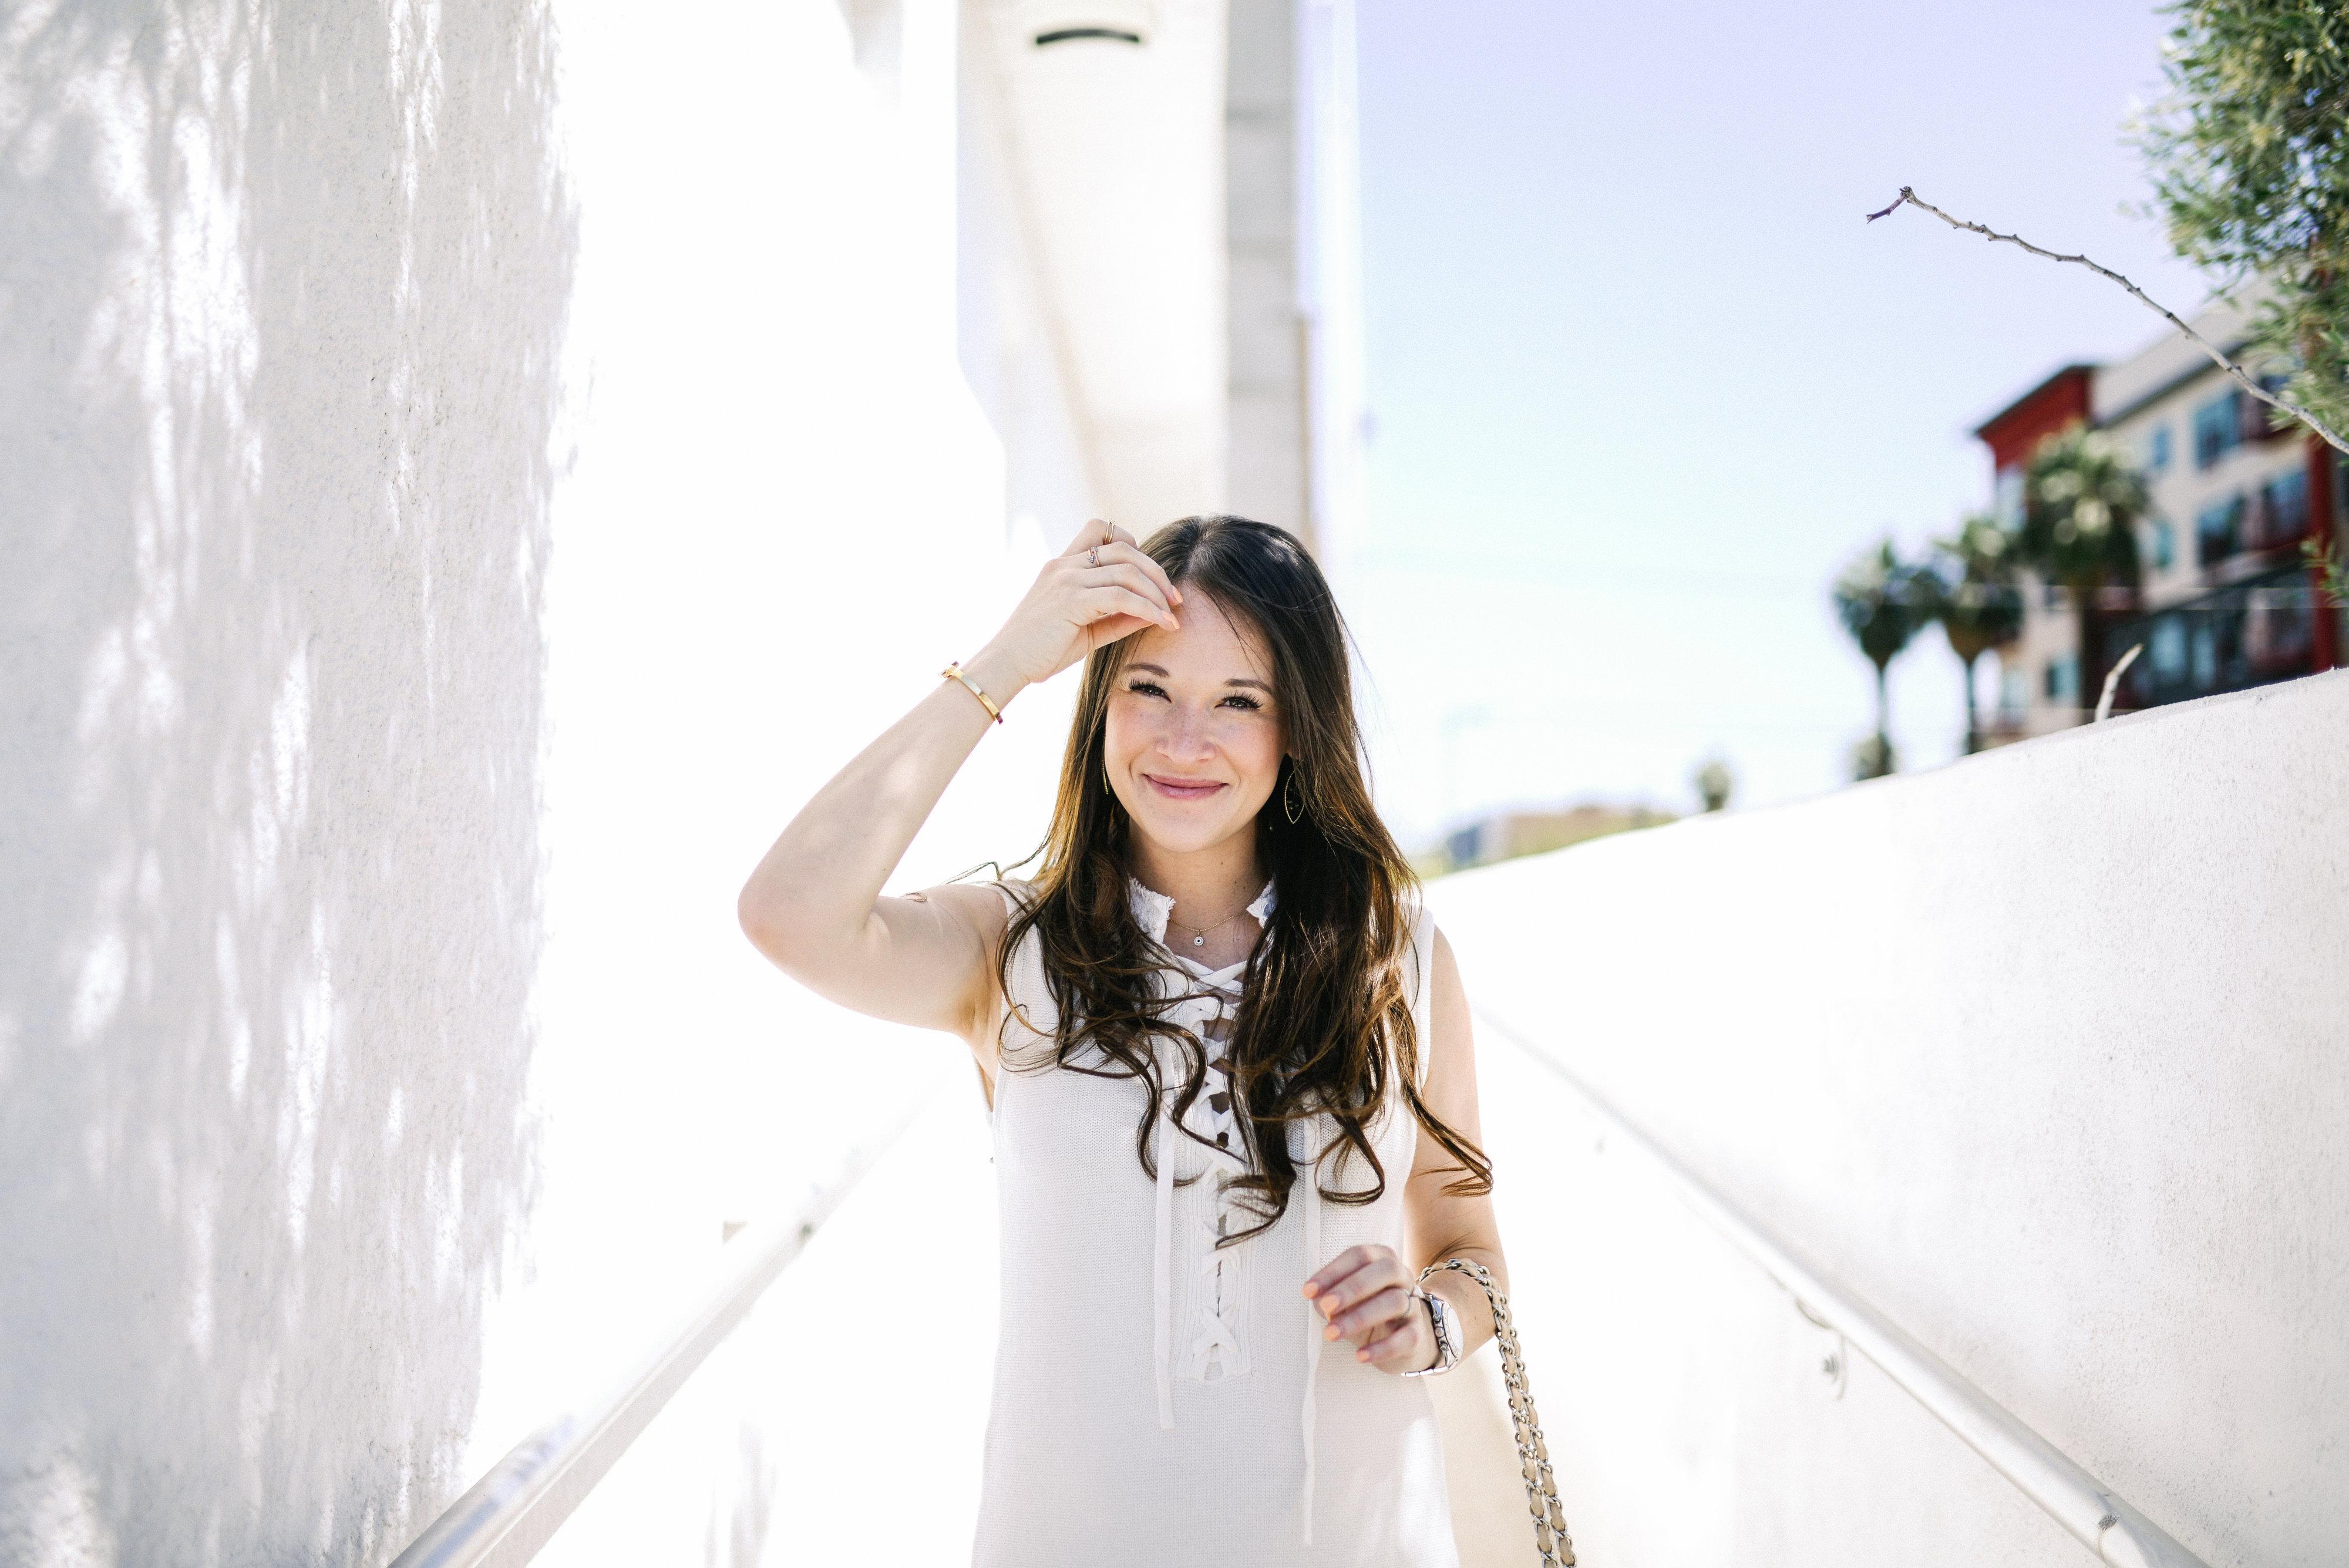 White Nanette Lepore Dress-Call me Lore